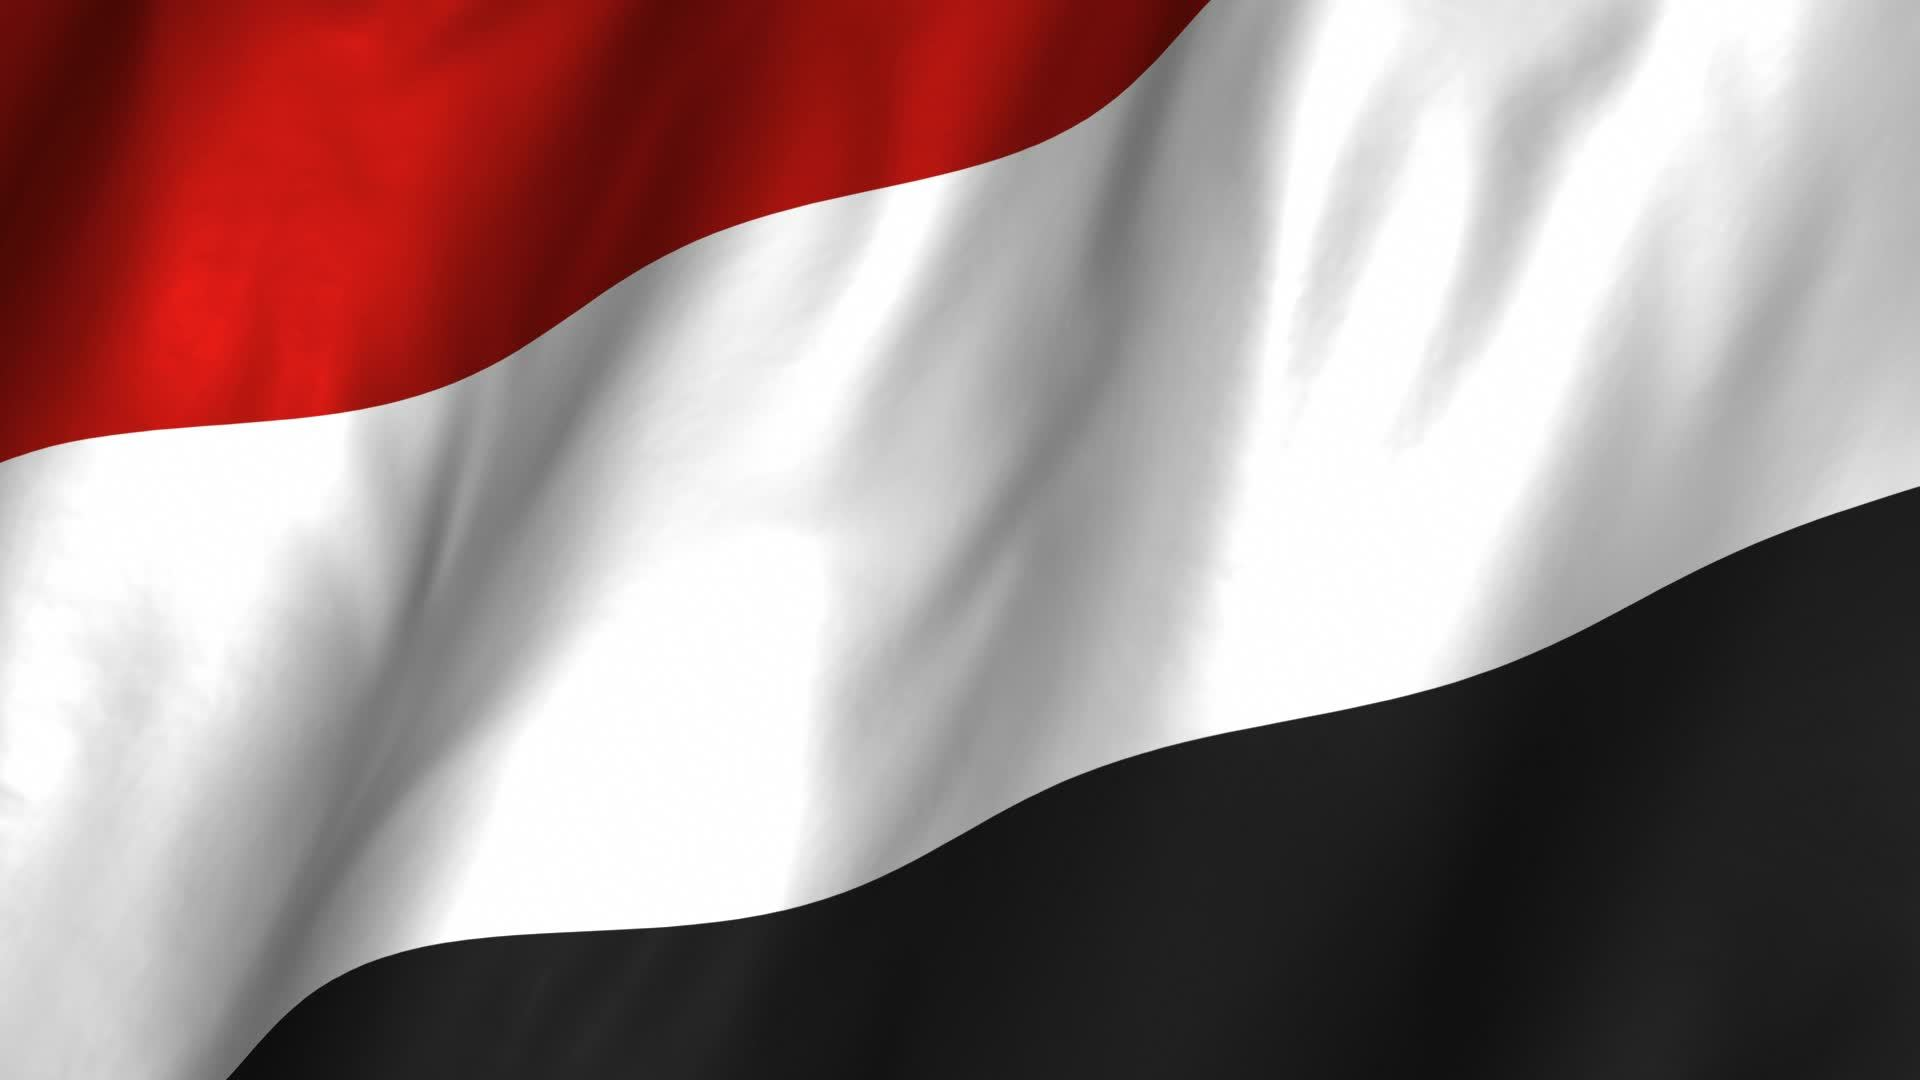 Yemen Flag Wallpaper   MixHD wallpapers   Daily Pnut 1920x1080